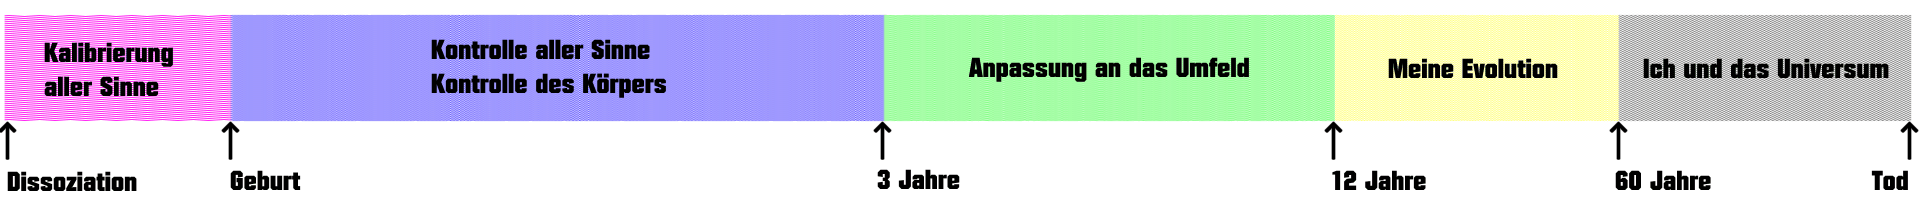 PhasenPerson